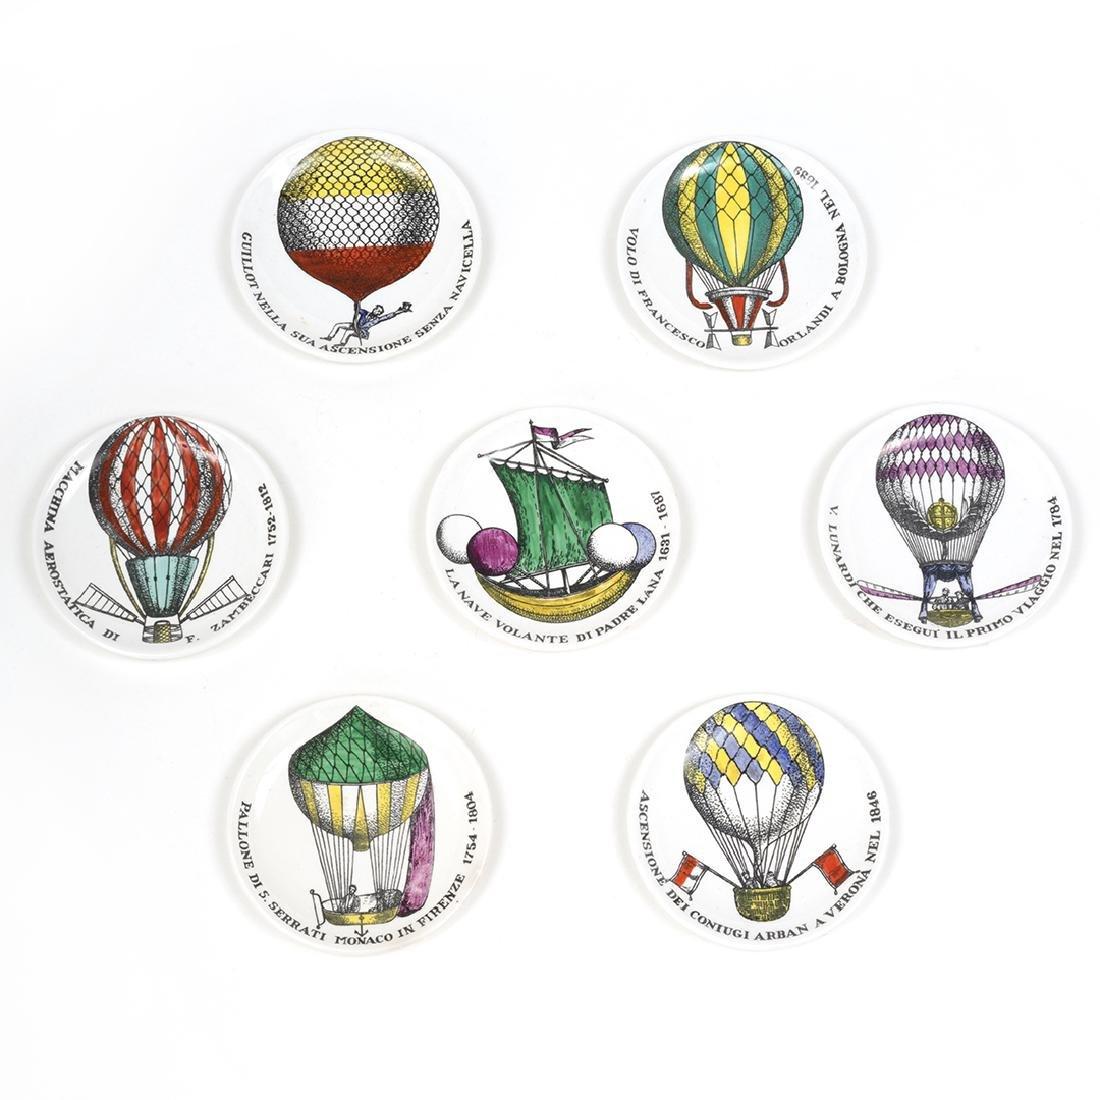 Piero Fornasetti Coasters (7)